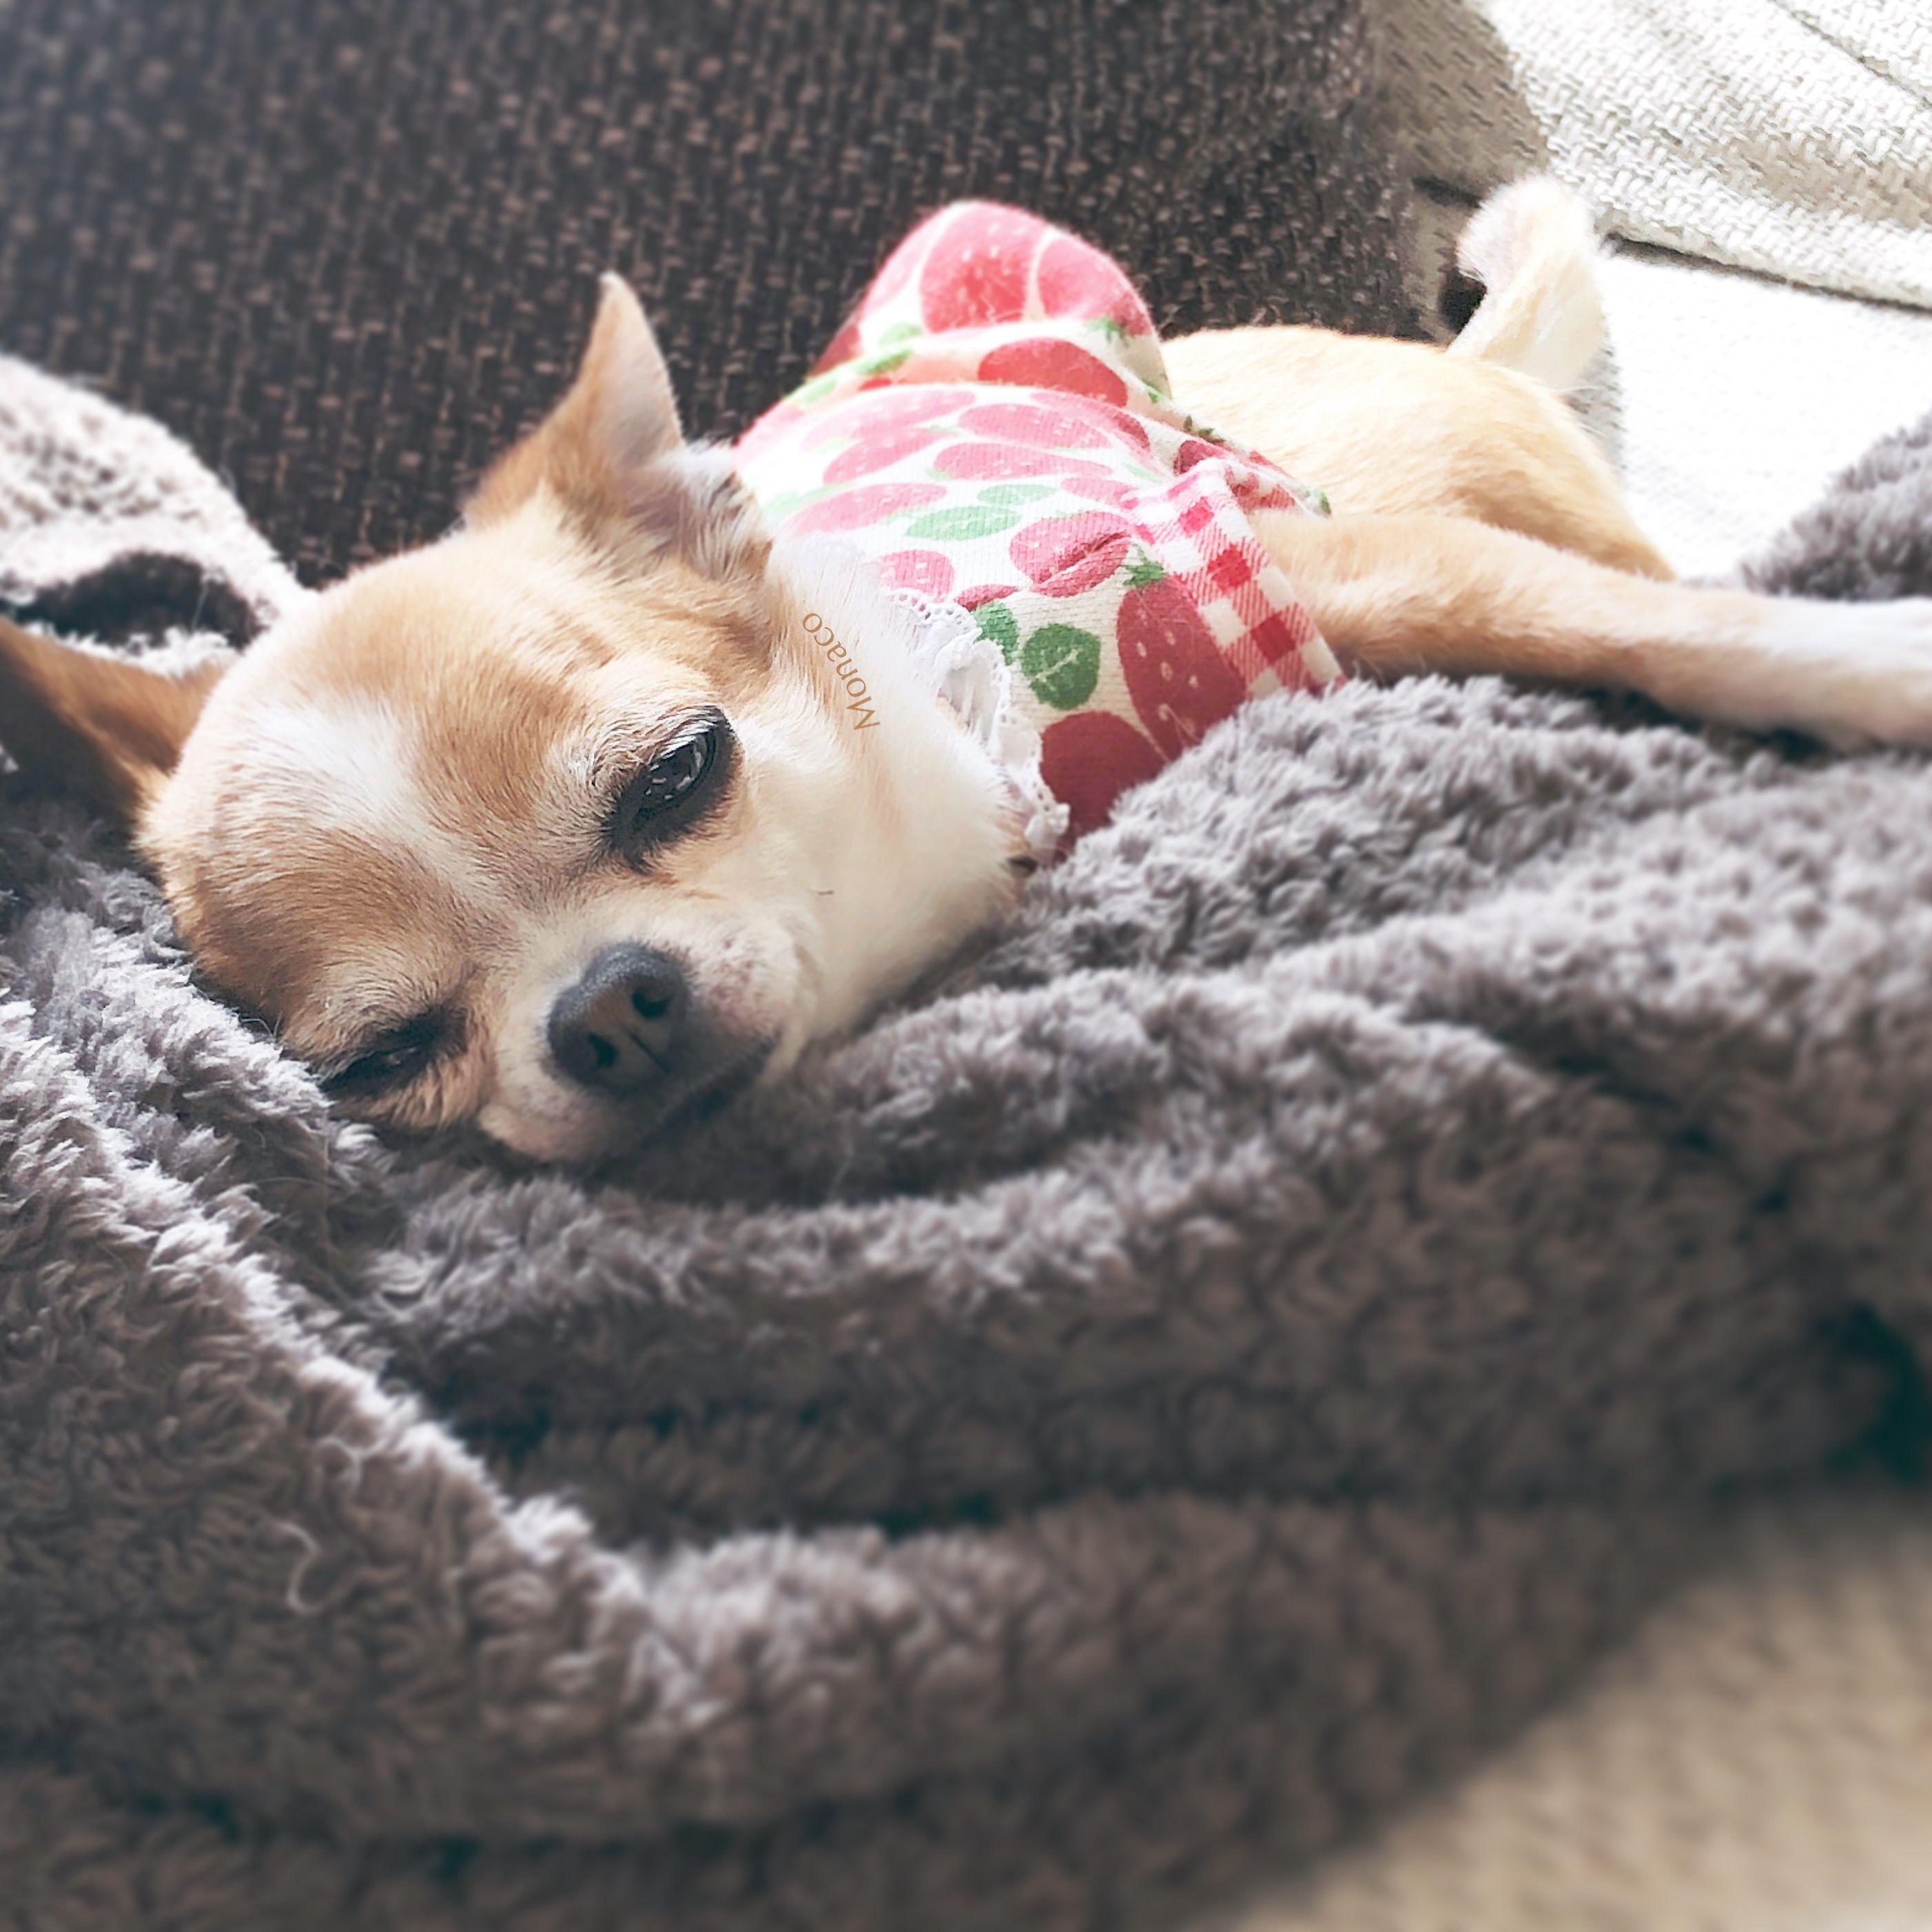 Pin By Sharon Carter On Pets Pet Stuff Chihuahua Love